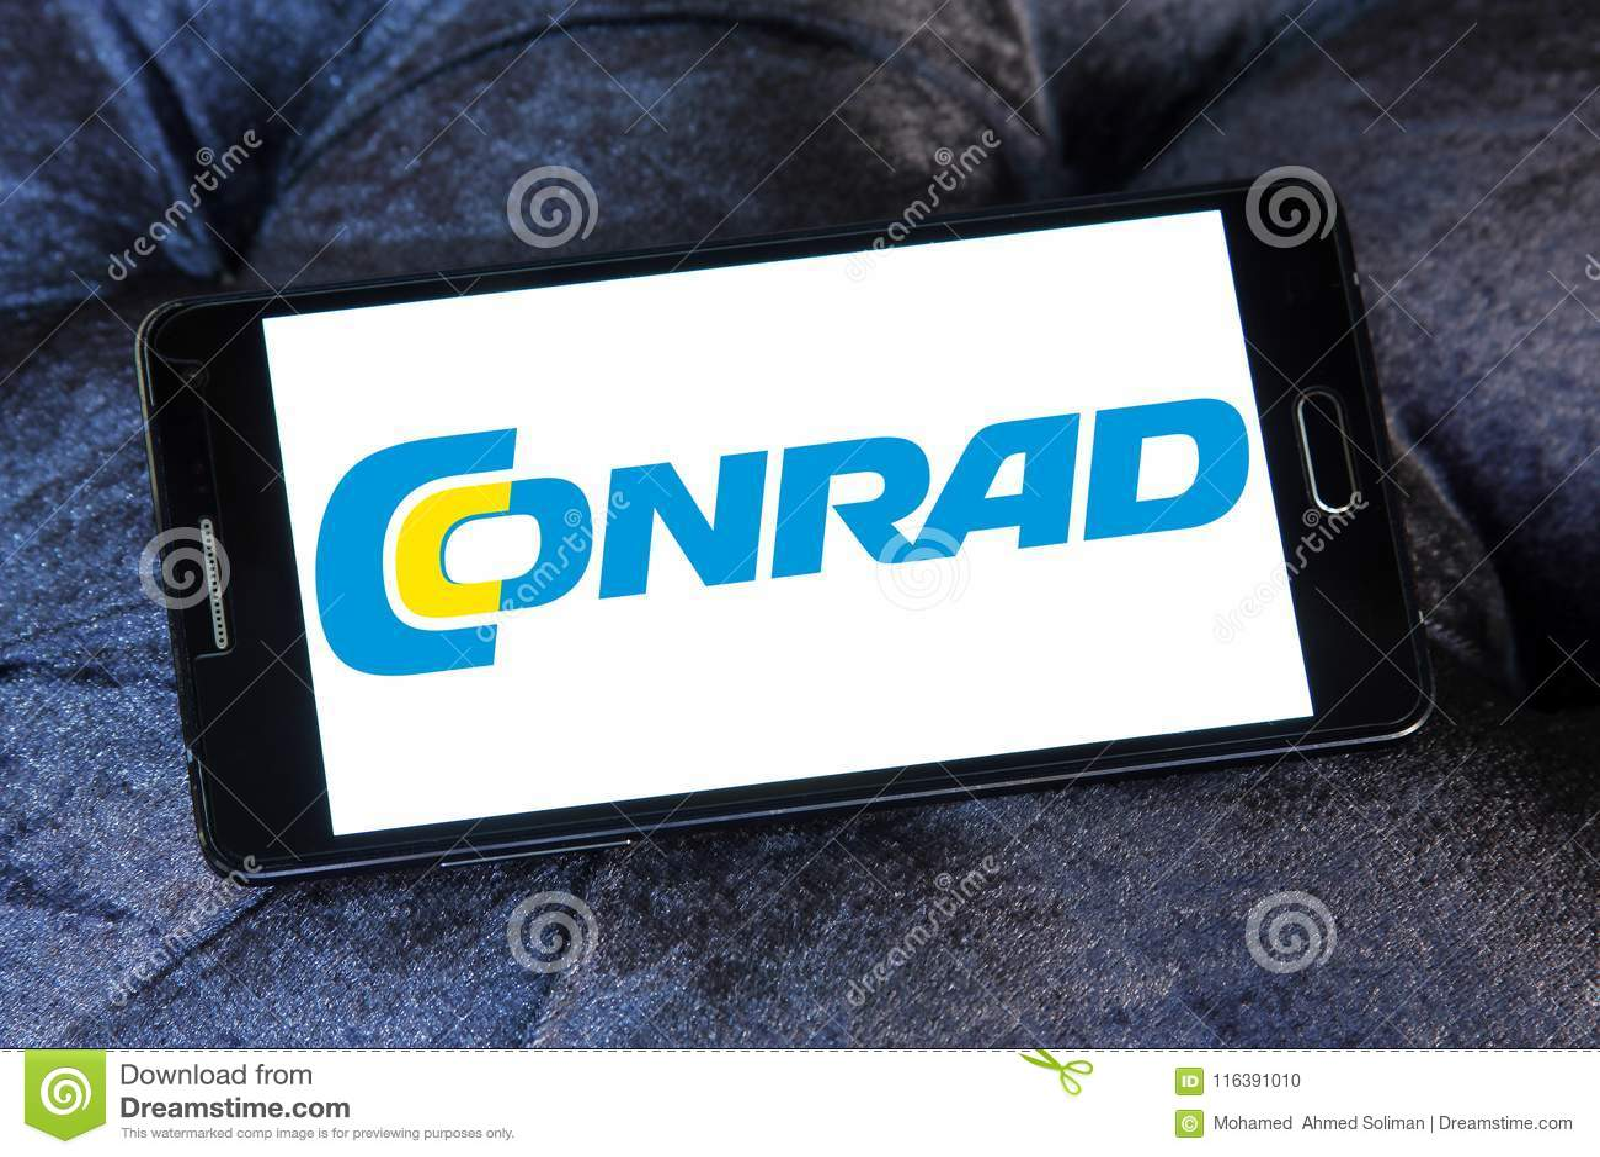 Conrad Electronics Retailer Logo Editorial Image - Image of logo